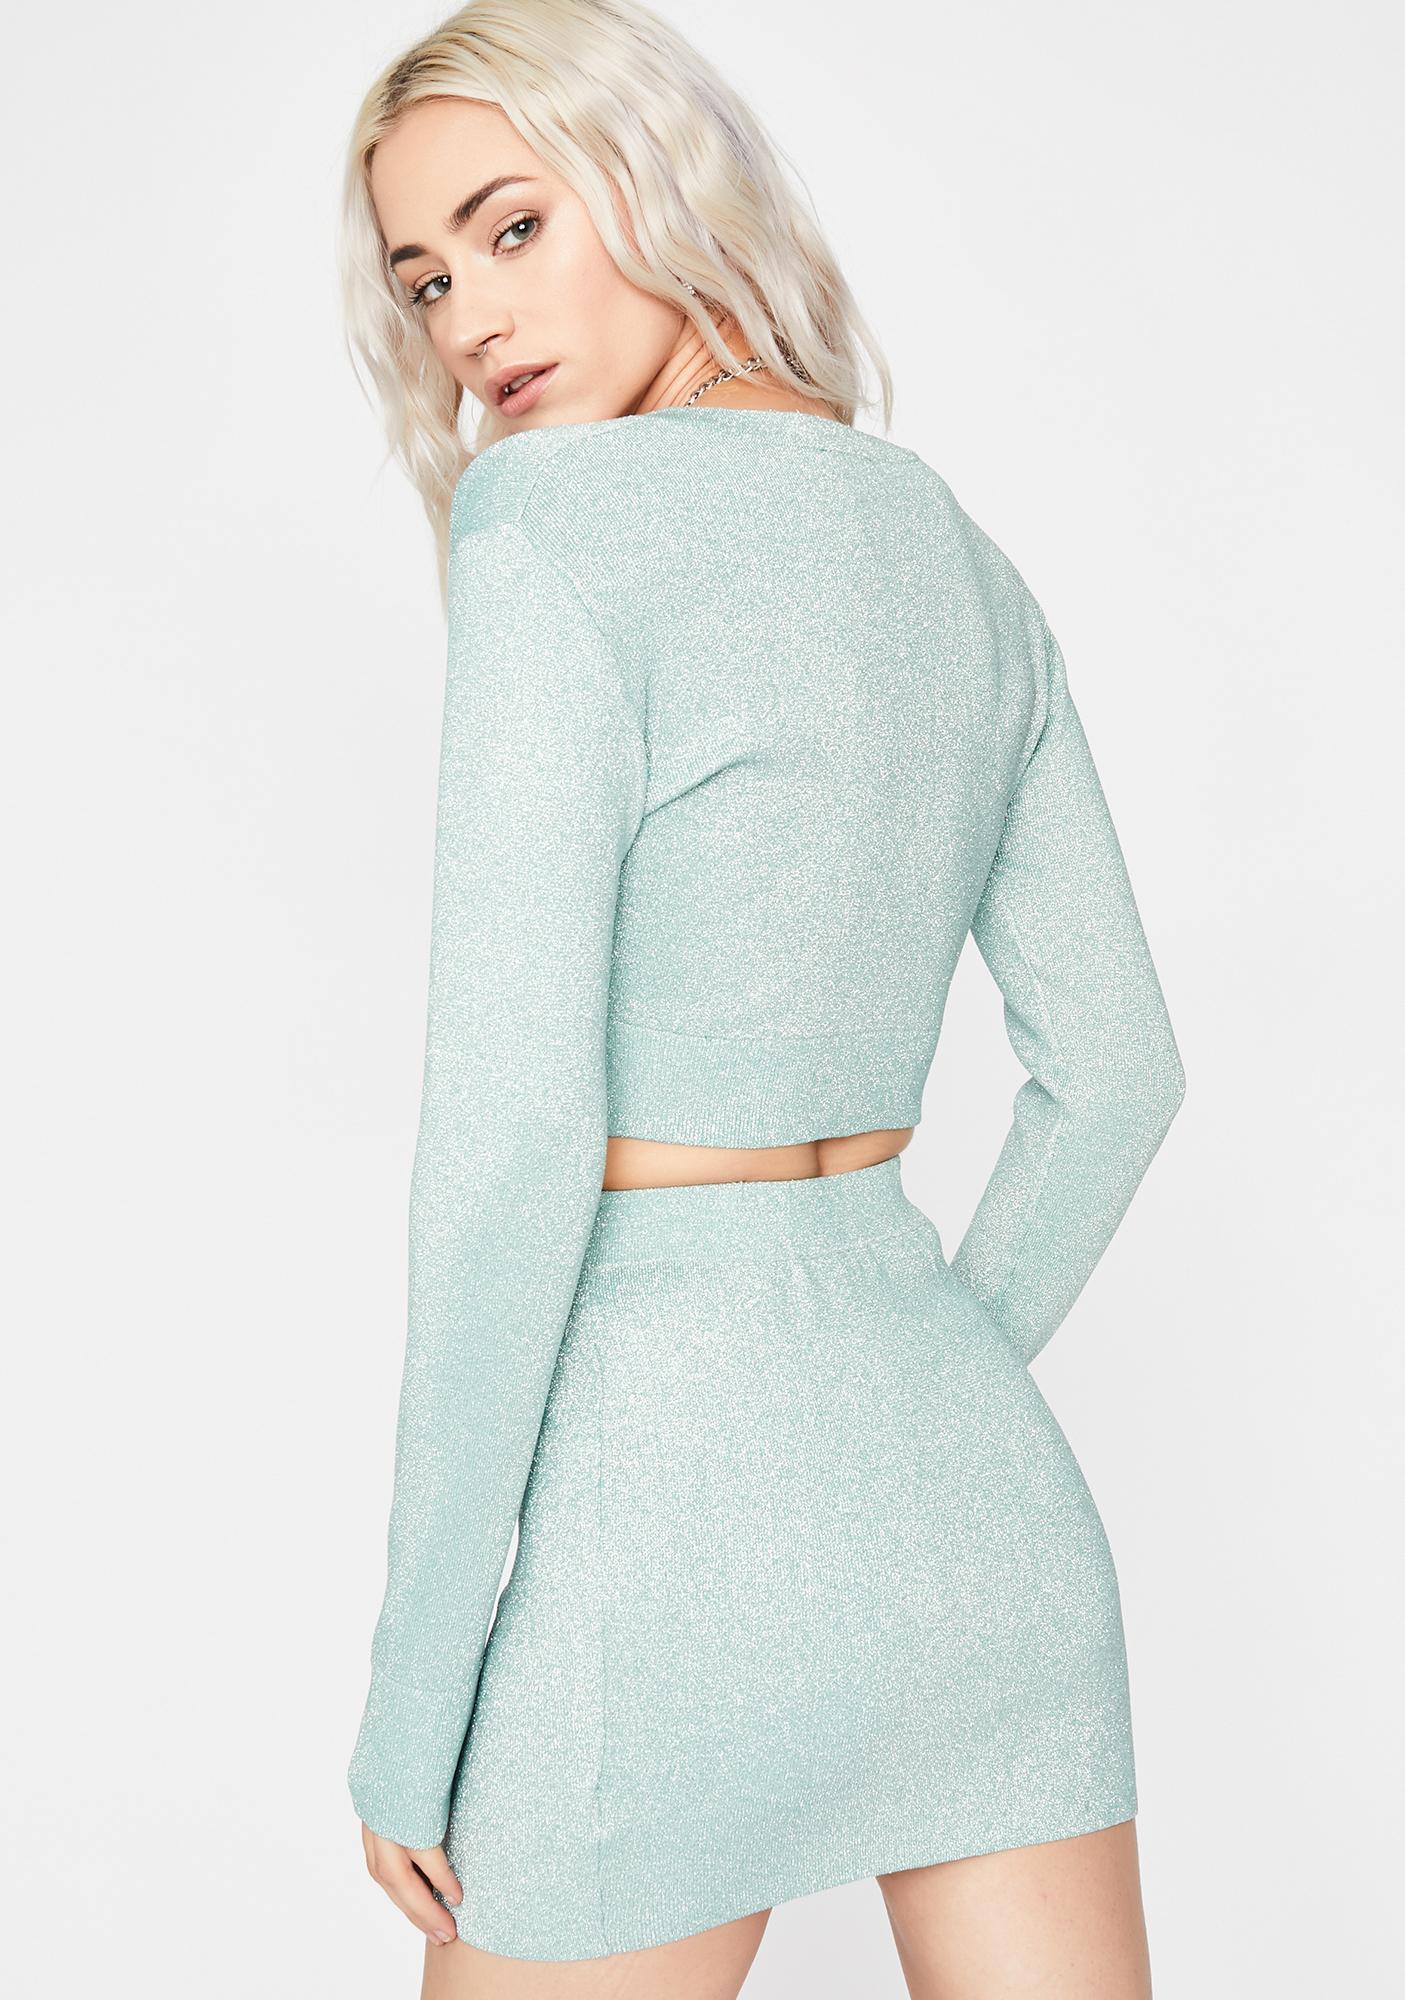 Droppin' Digits Skirt Set